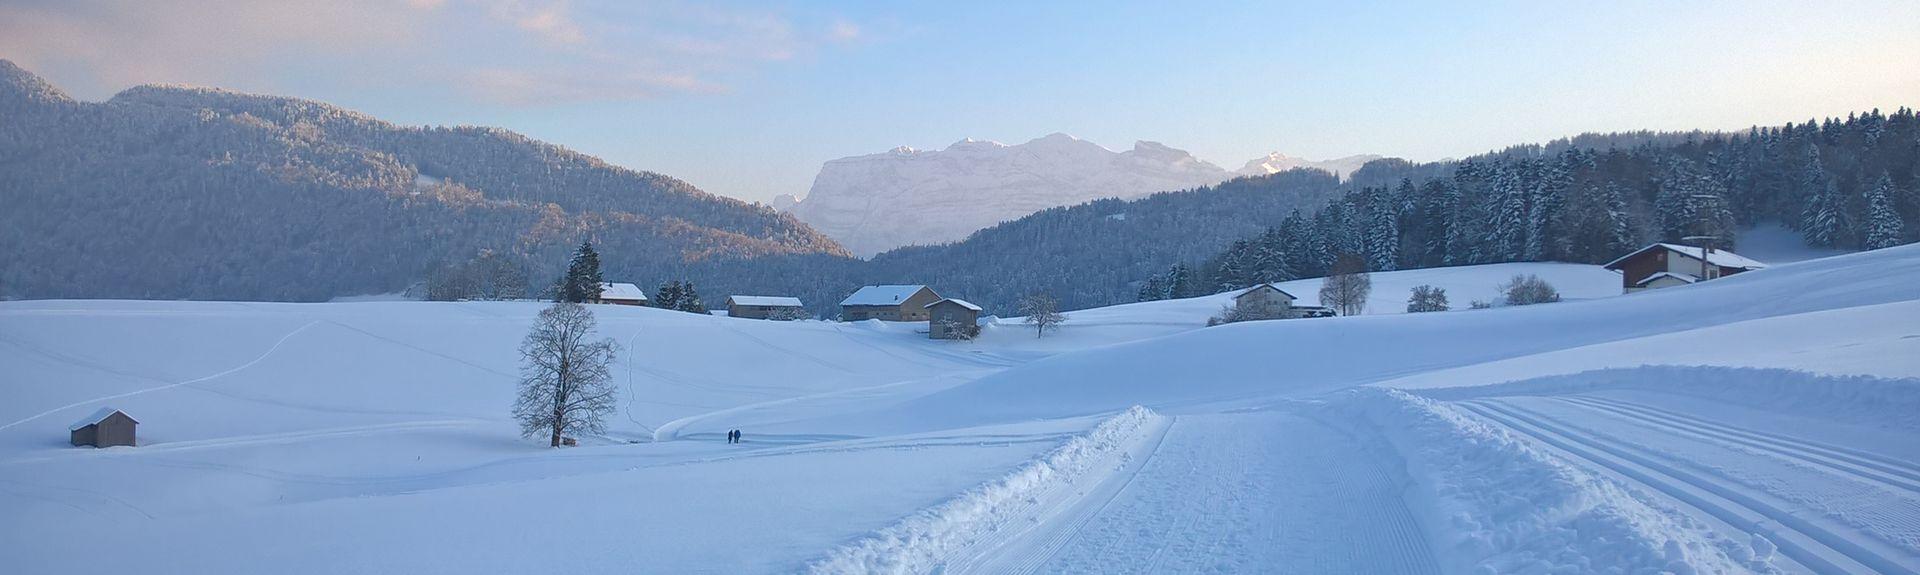 Steinmaehder Ski Lift, Lech, Austria